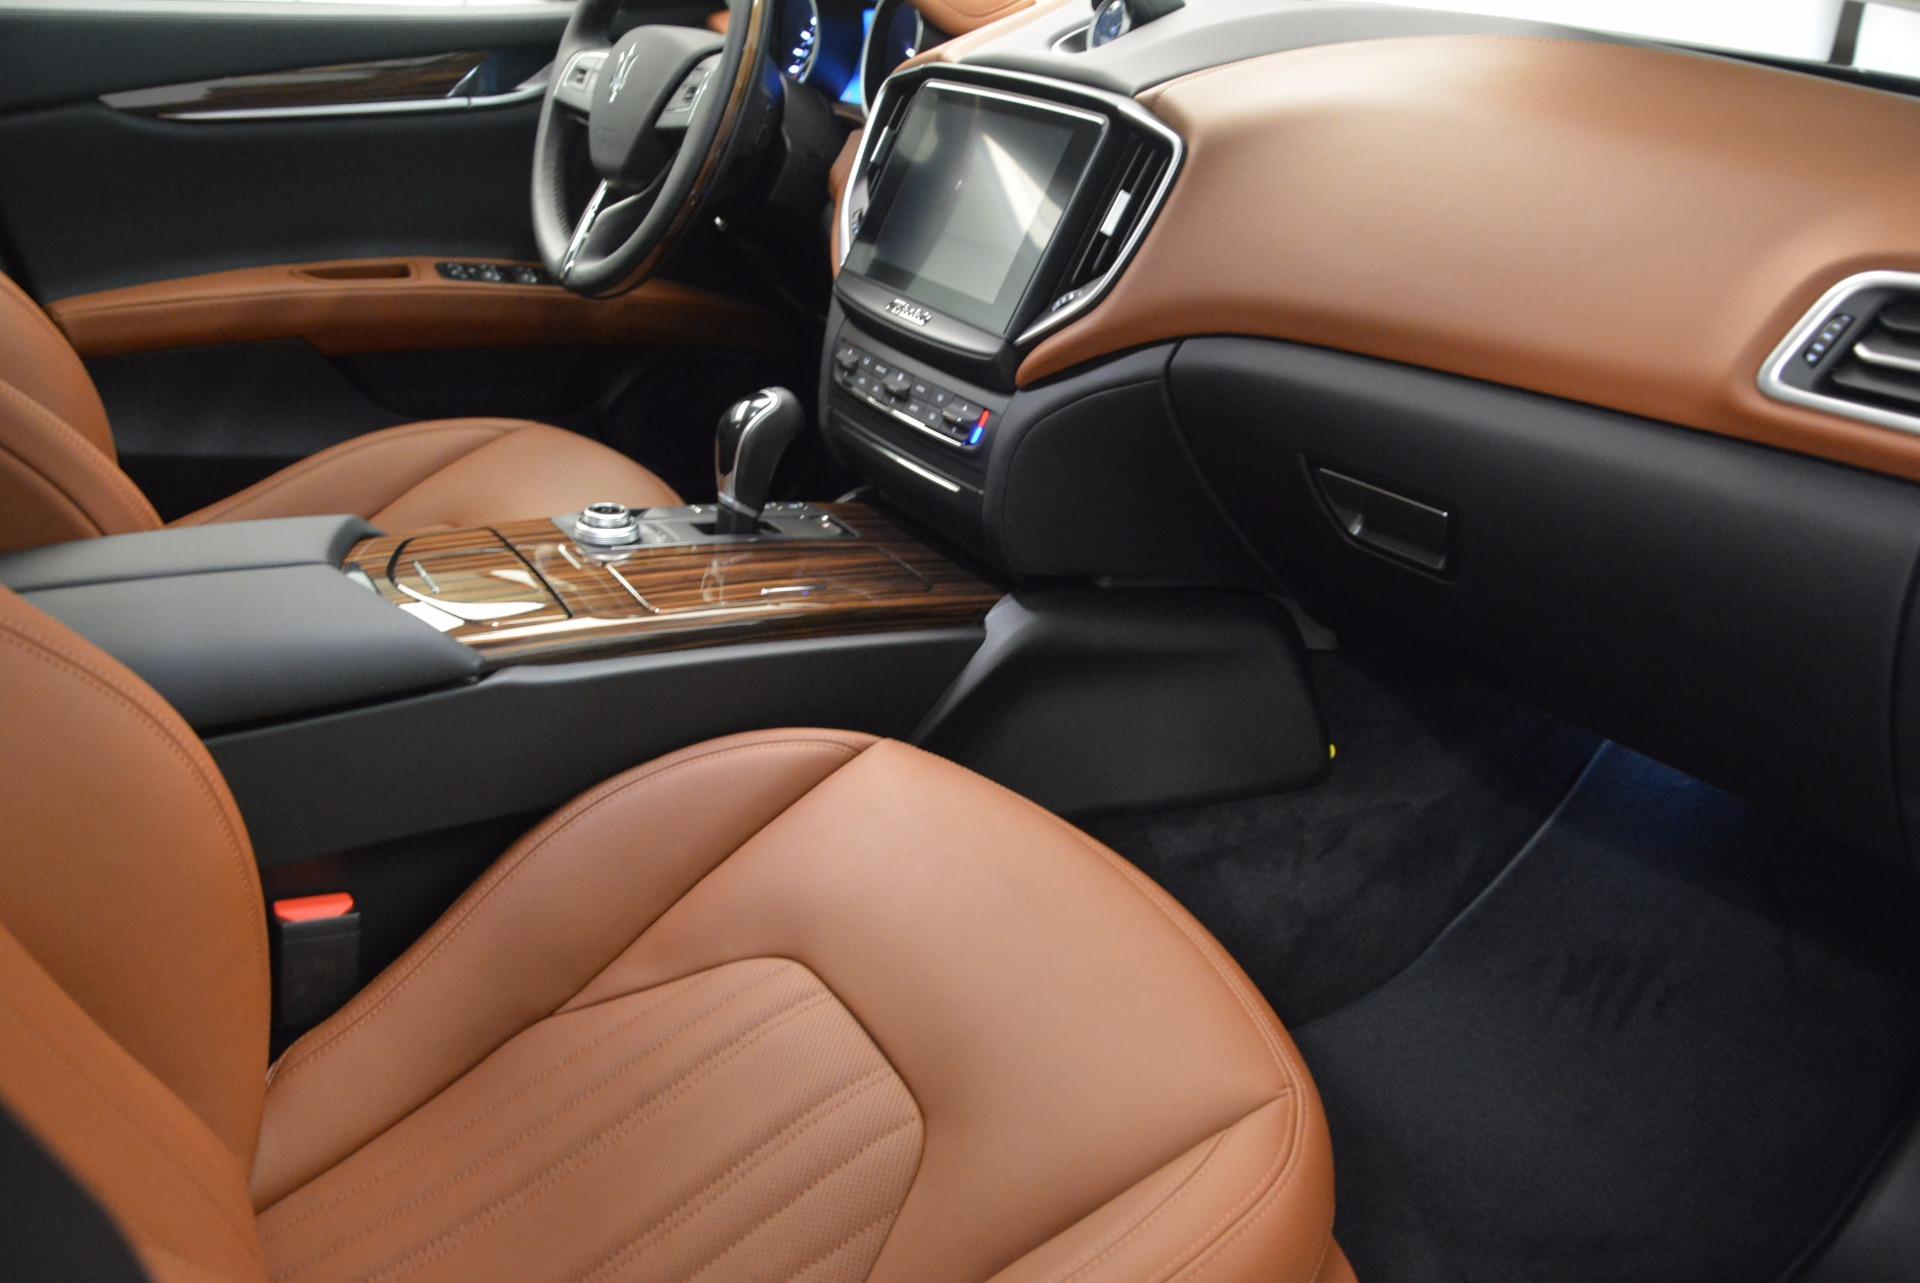 New 2018 Maserati Ghibli S Q4 GranLusso For Sale In Westport, CT 1866_p21